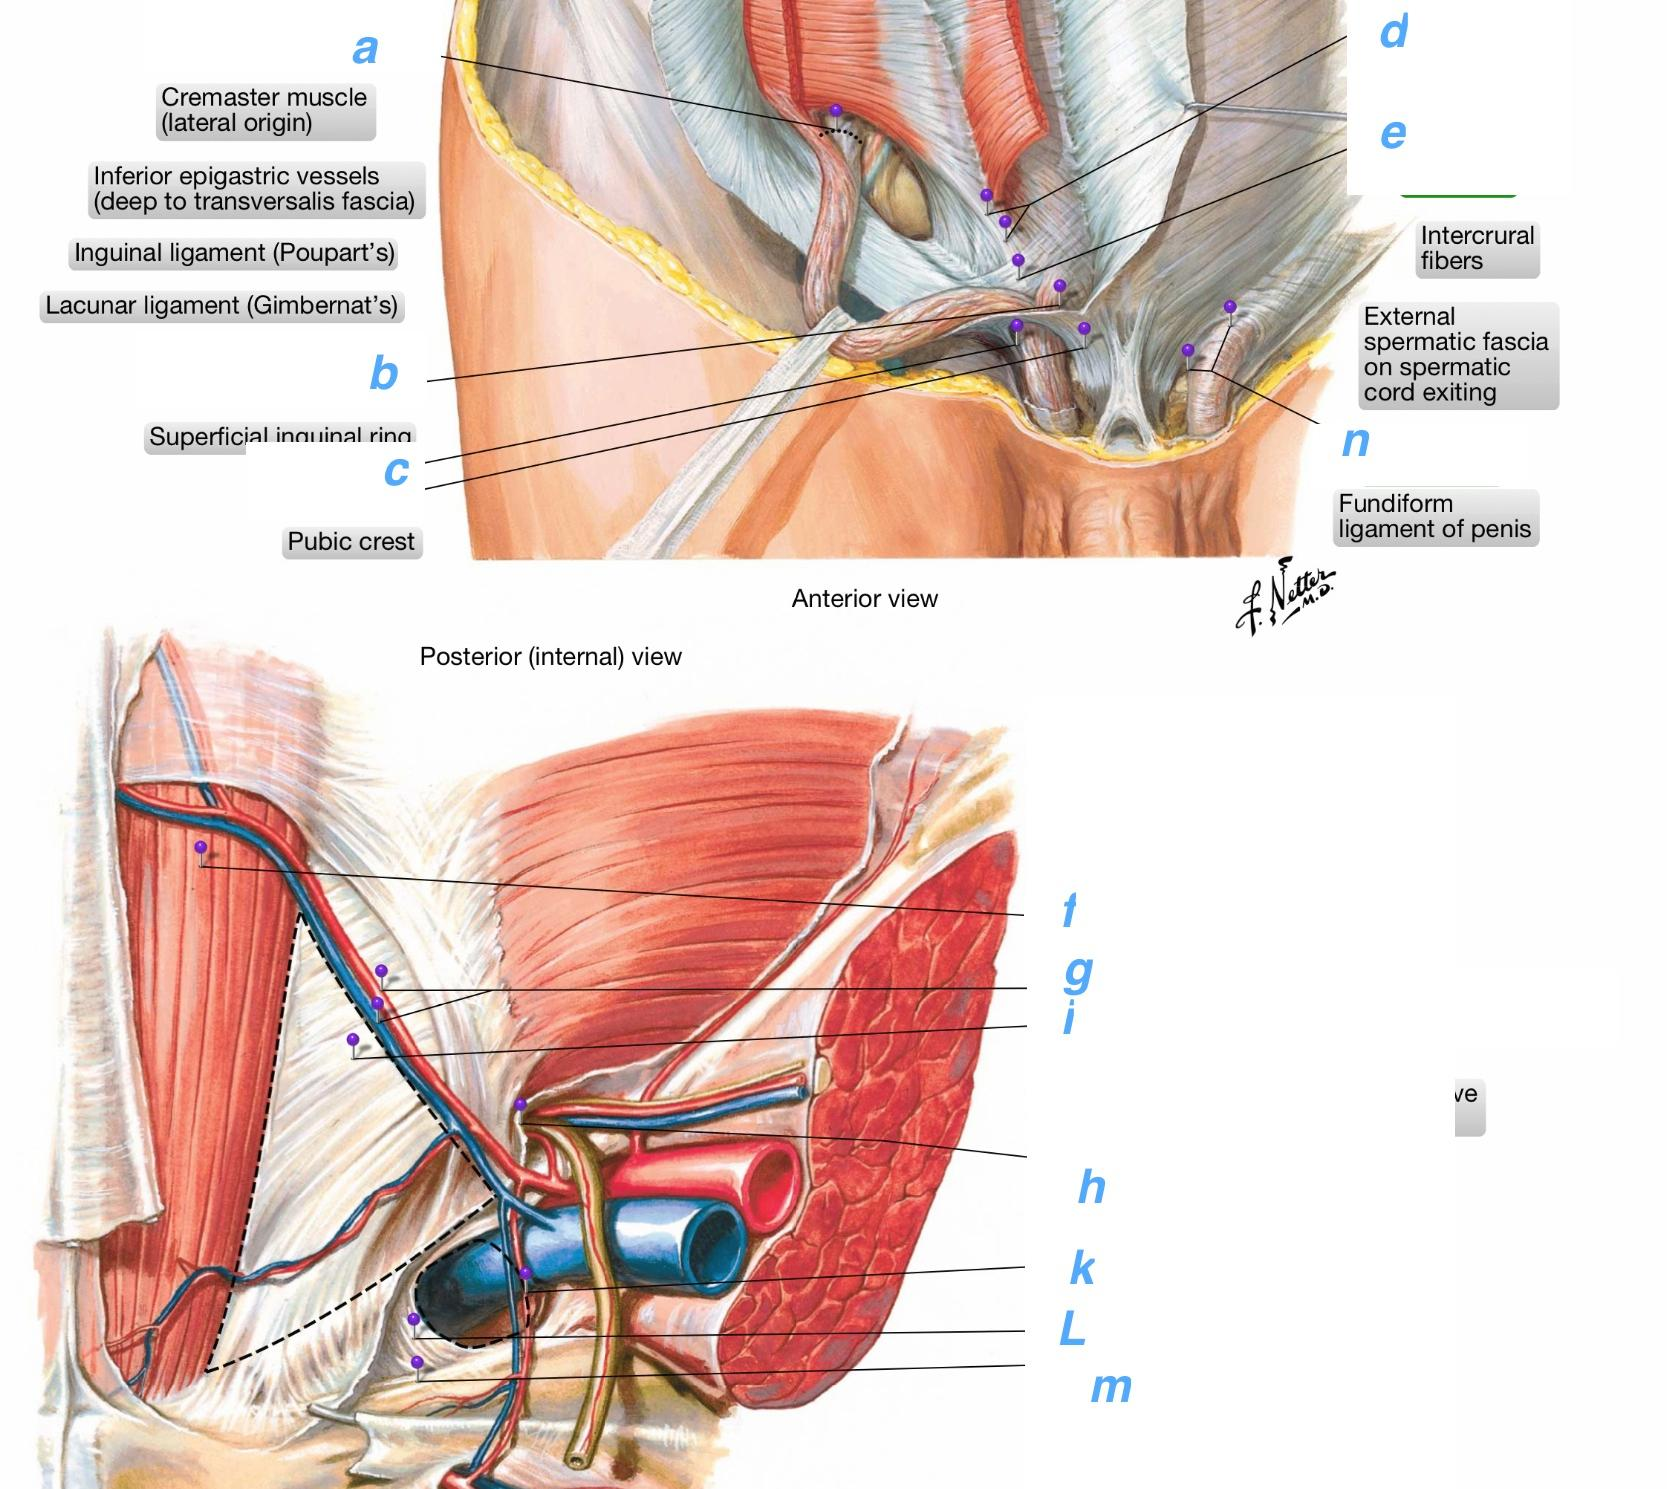 inguinal ligament anatomy ppt - ModernHeal.com